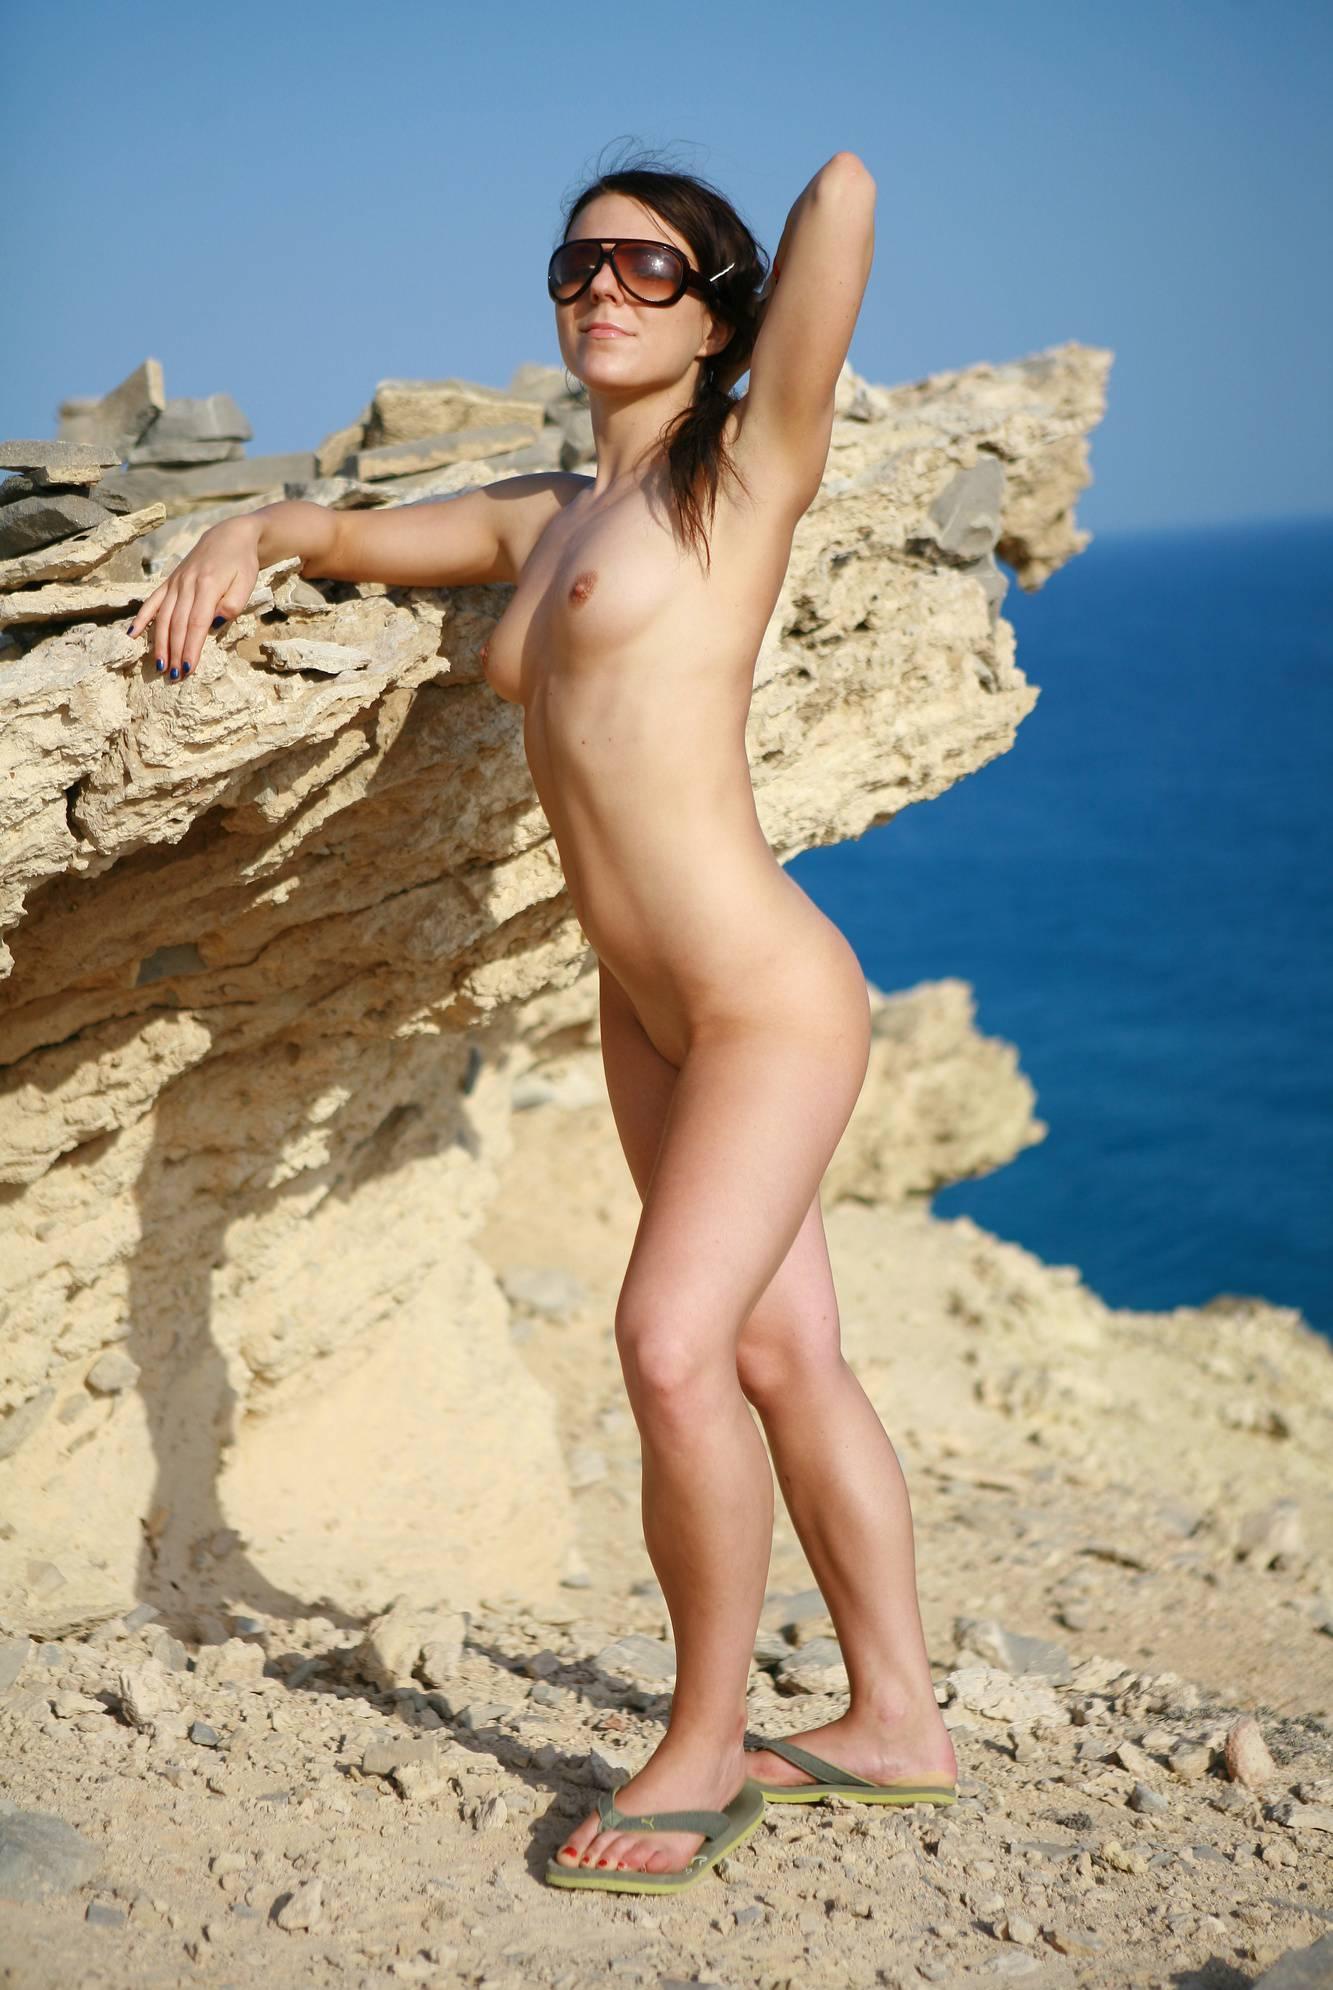 Pure Nudism Pics-Greek Girl Cliff Hangers - 3